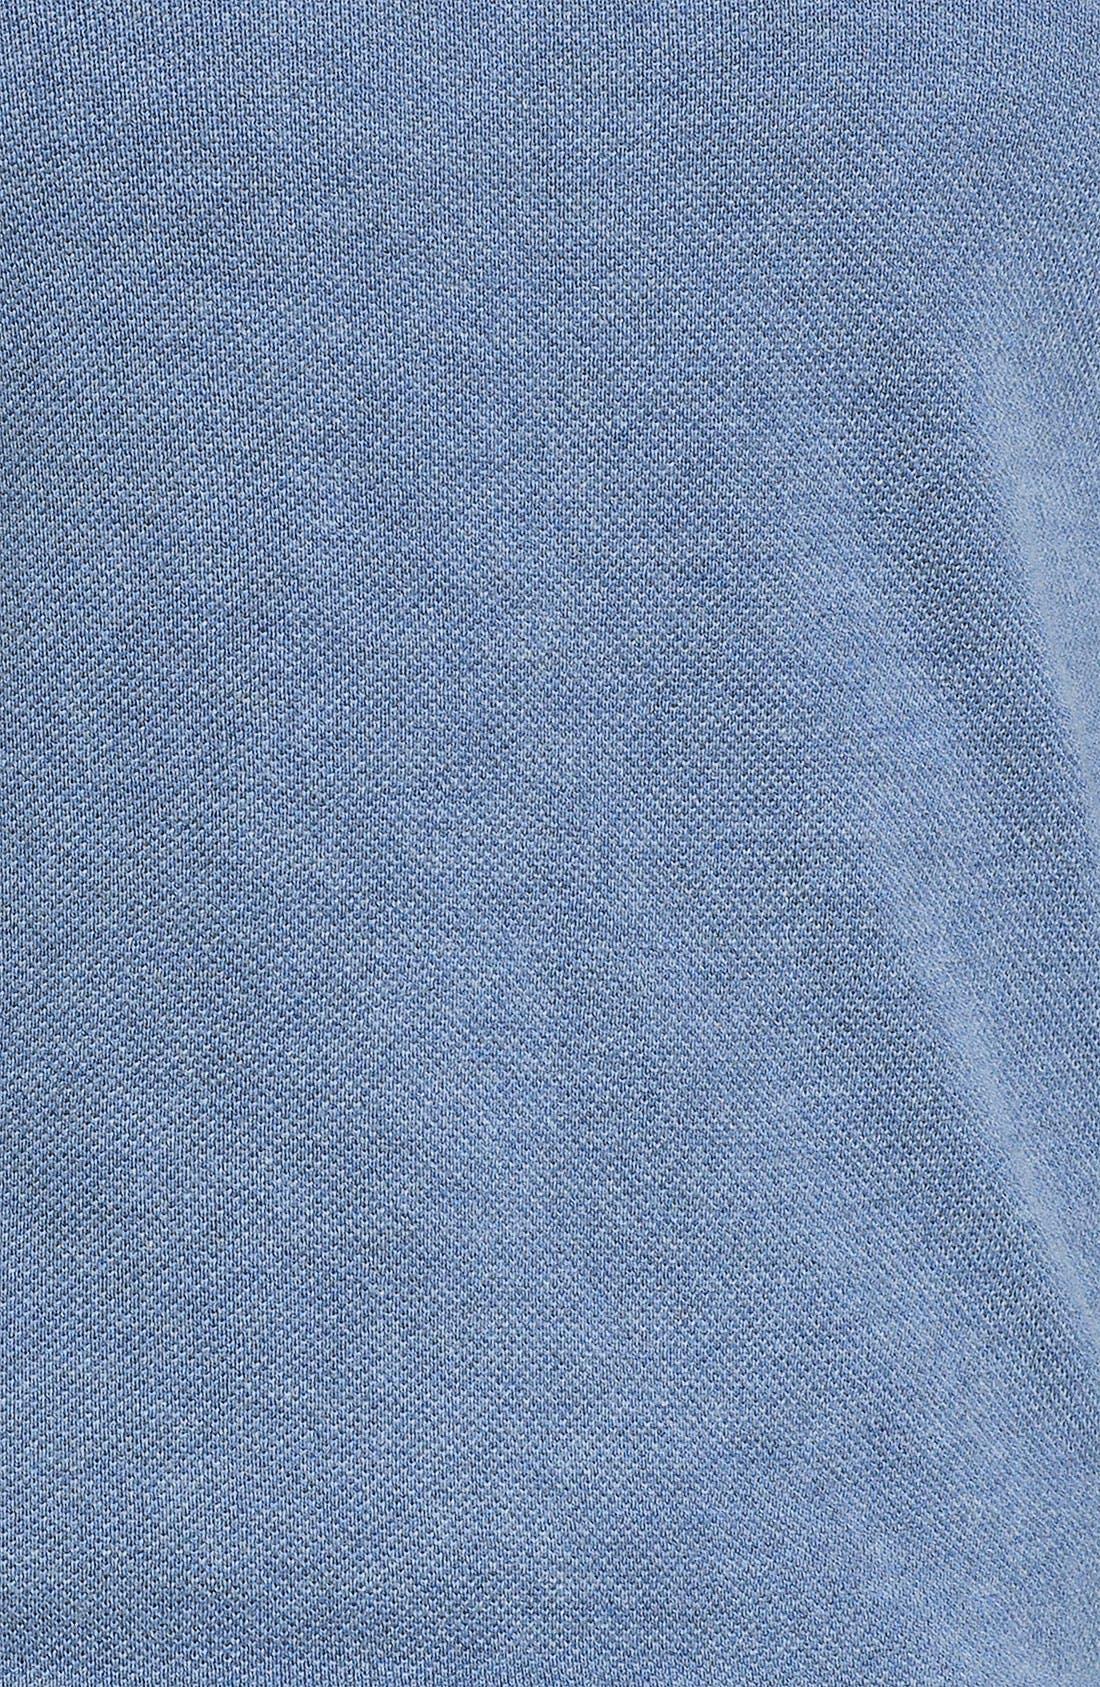 Alternate Image 3  - Polo Ralph Lauren V-Neck Cotton & Cashmere Classic Fit Sweater